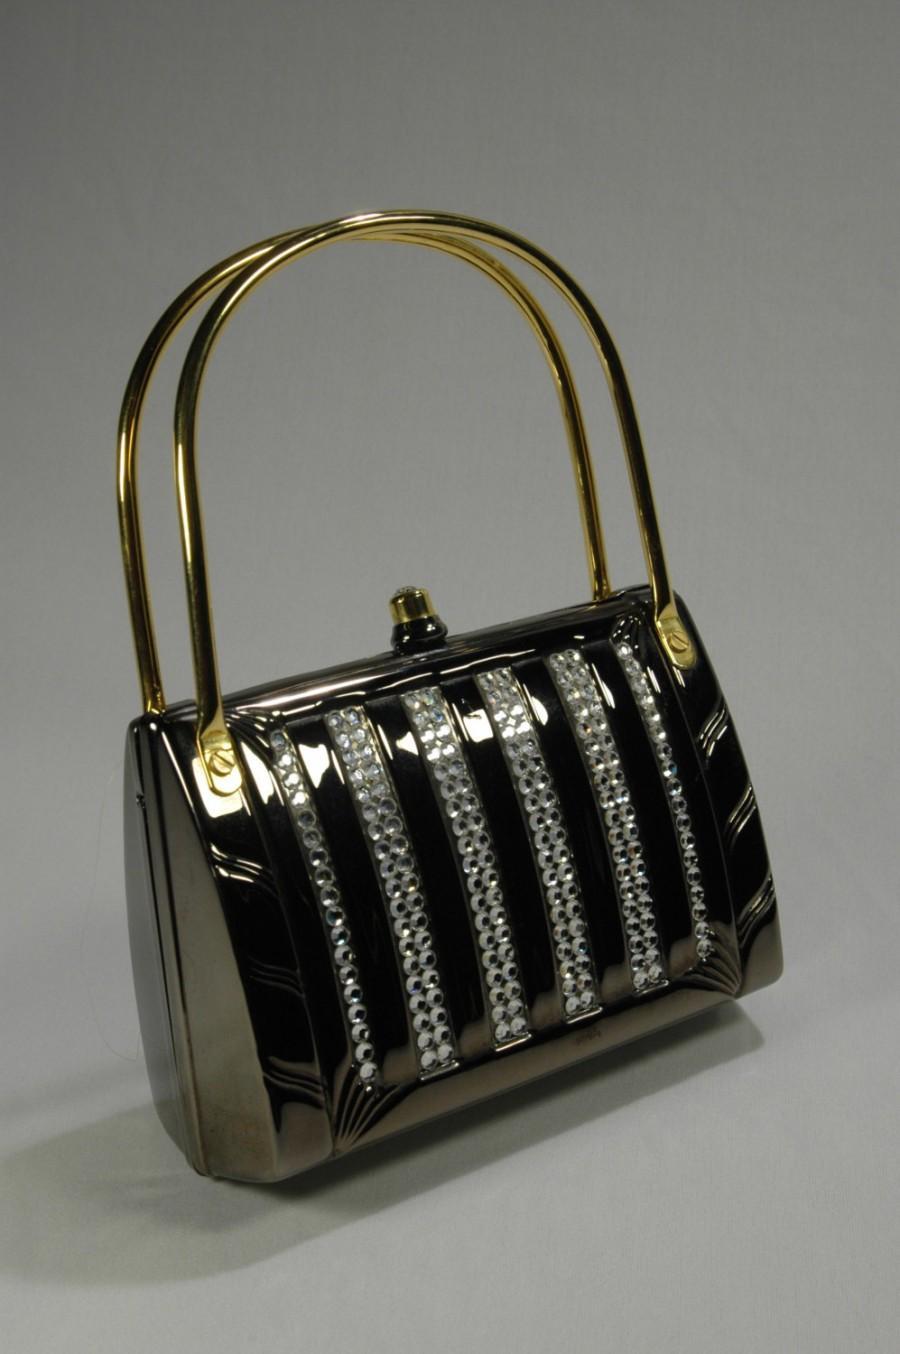 Judith Leiber Style Pewter Rhinestone Evening Bag Metal Gold Tone Cell Phone Holder Braided Chain Handbag